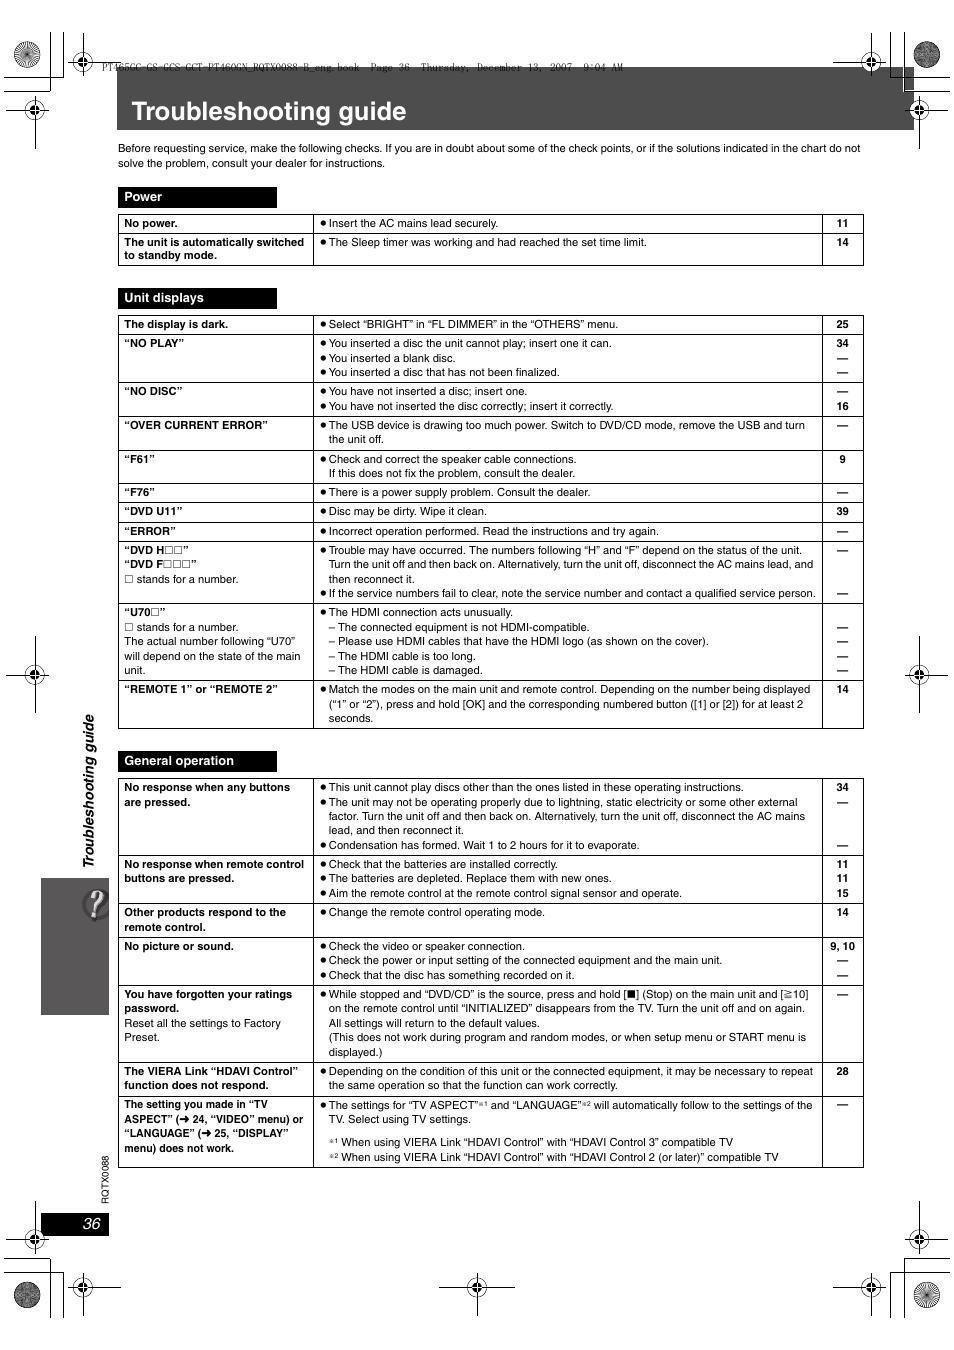 troubleshooting guide panasonic sc pt465 user manual page 36 rh manualsdir com tv fix guide melbourne tv troubleshooting guide pdf